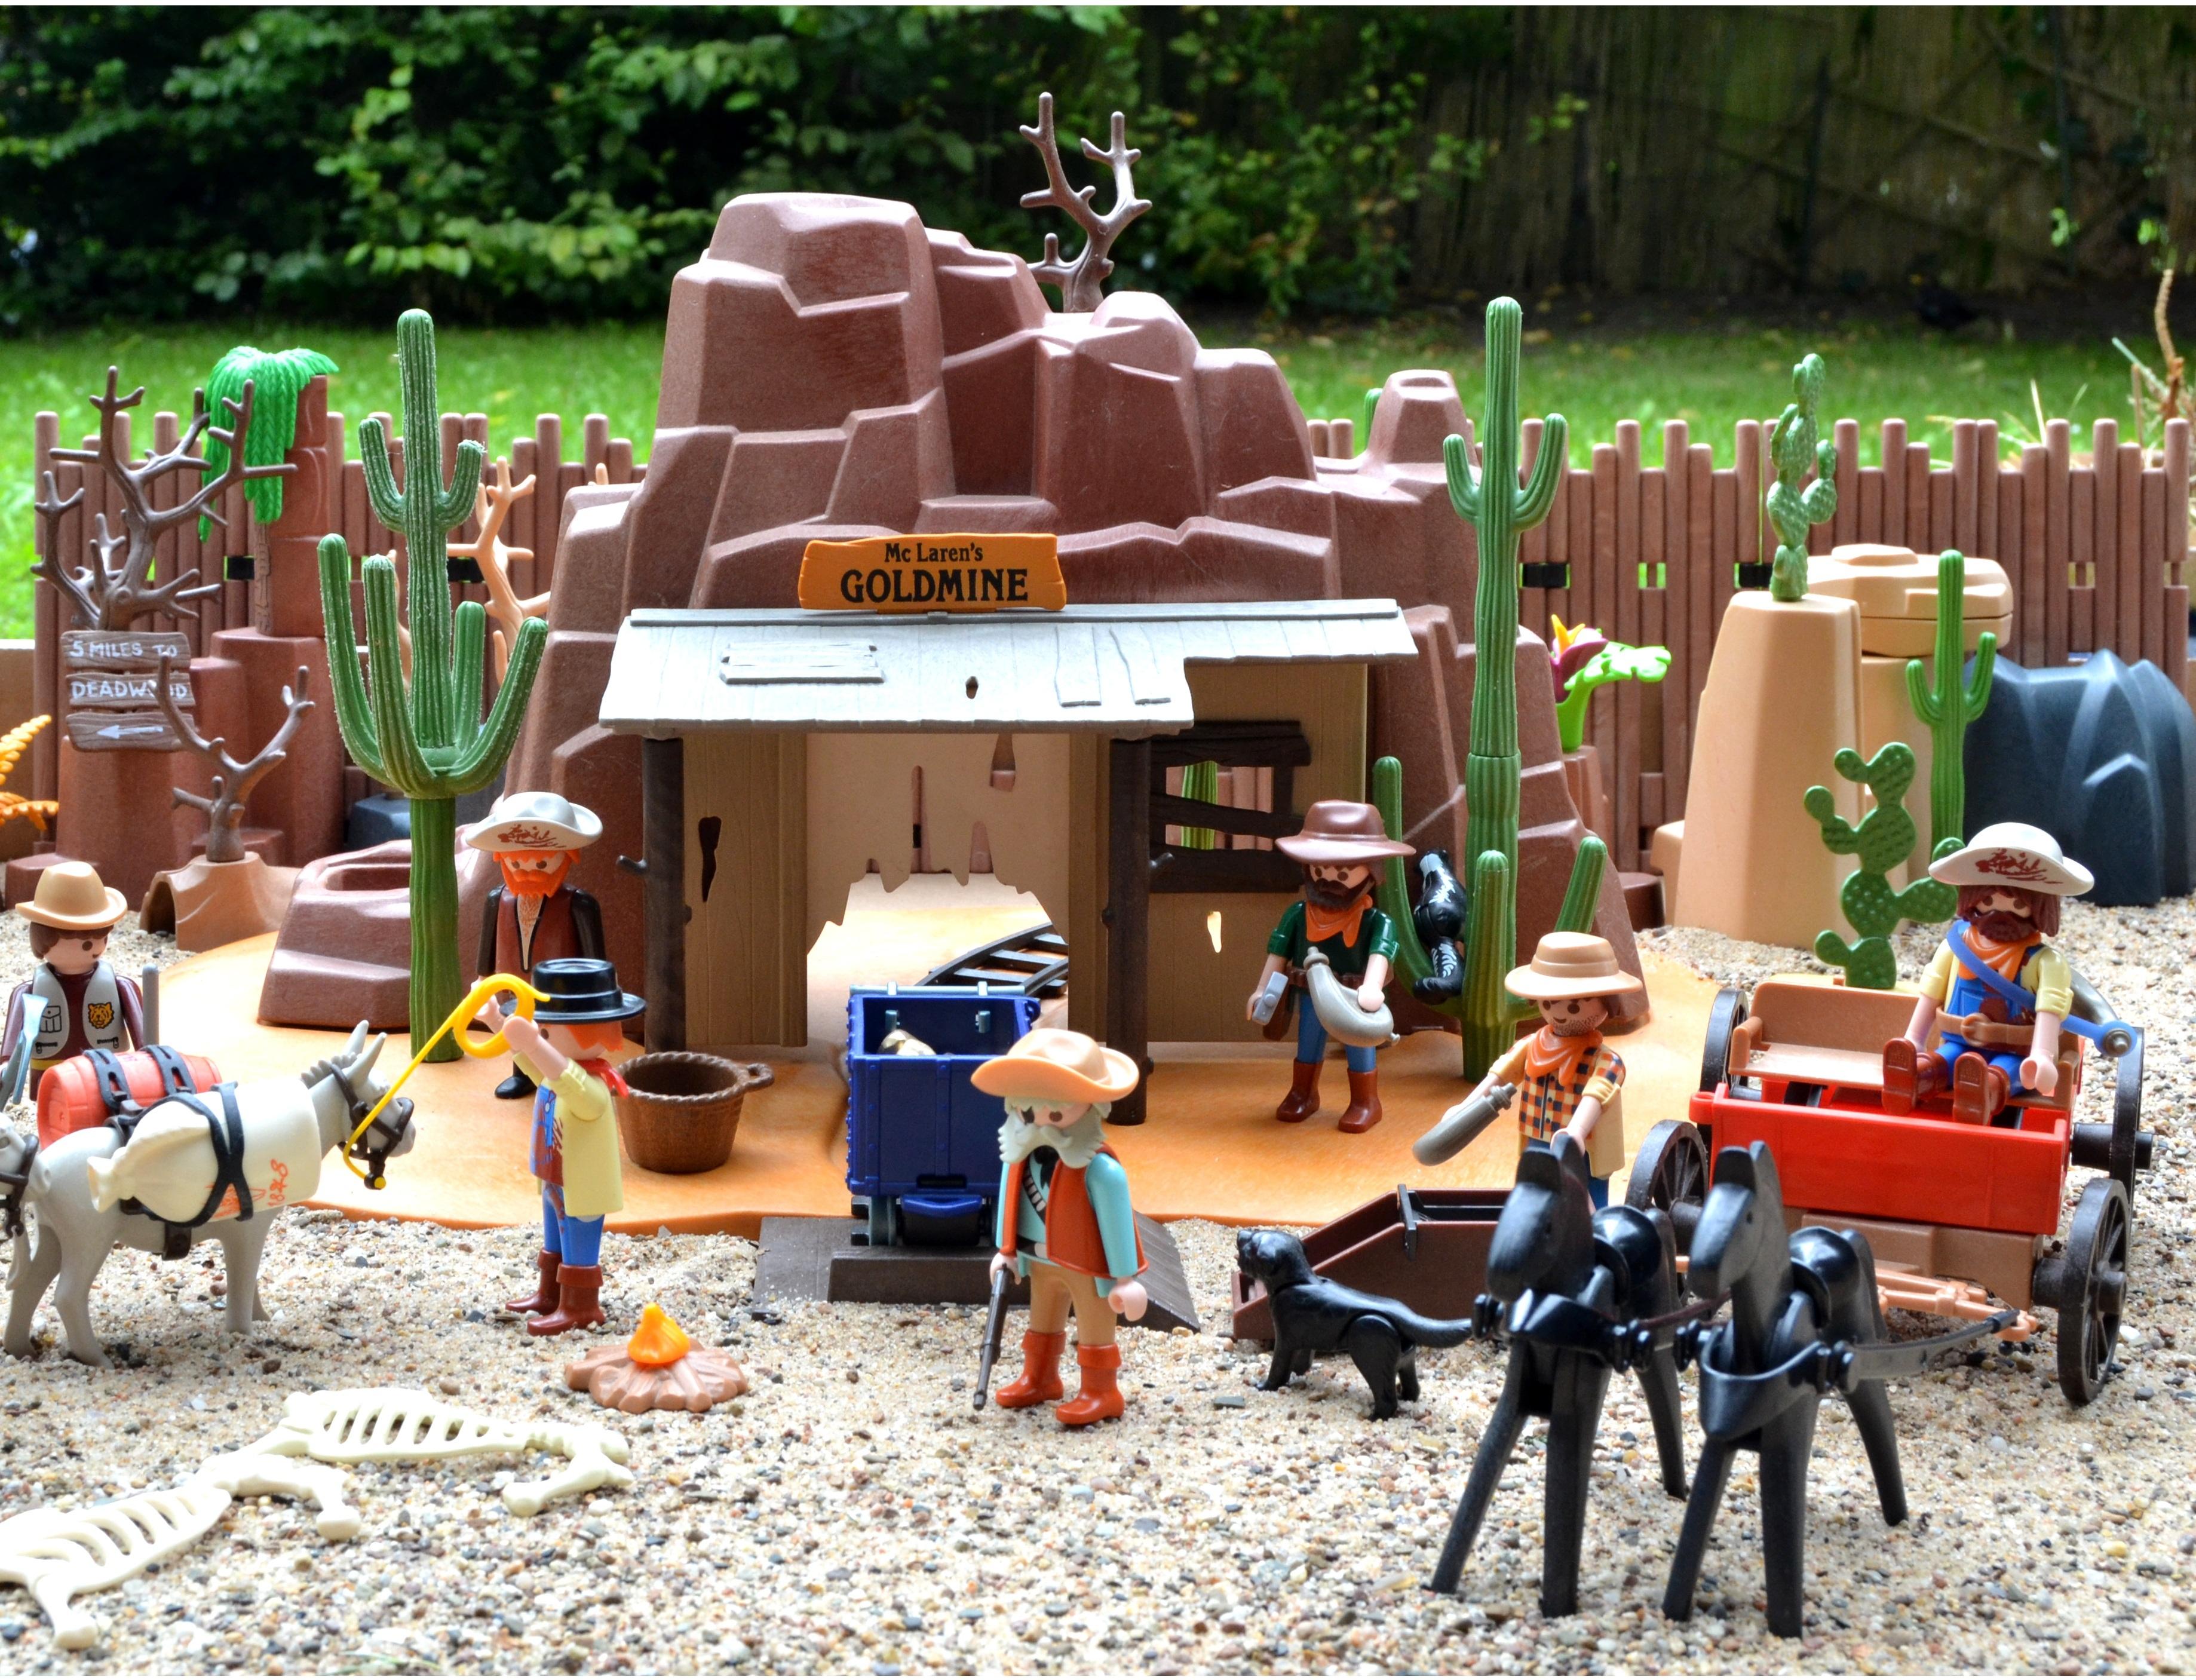 Backyard Toys free images : city, usa, america, backyard, toy, public space